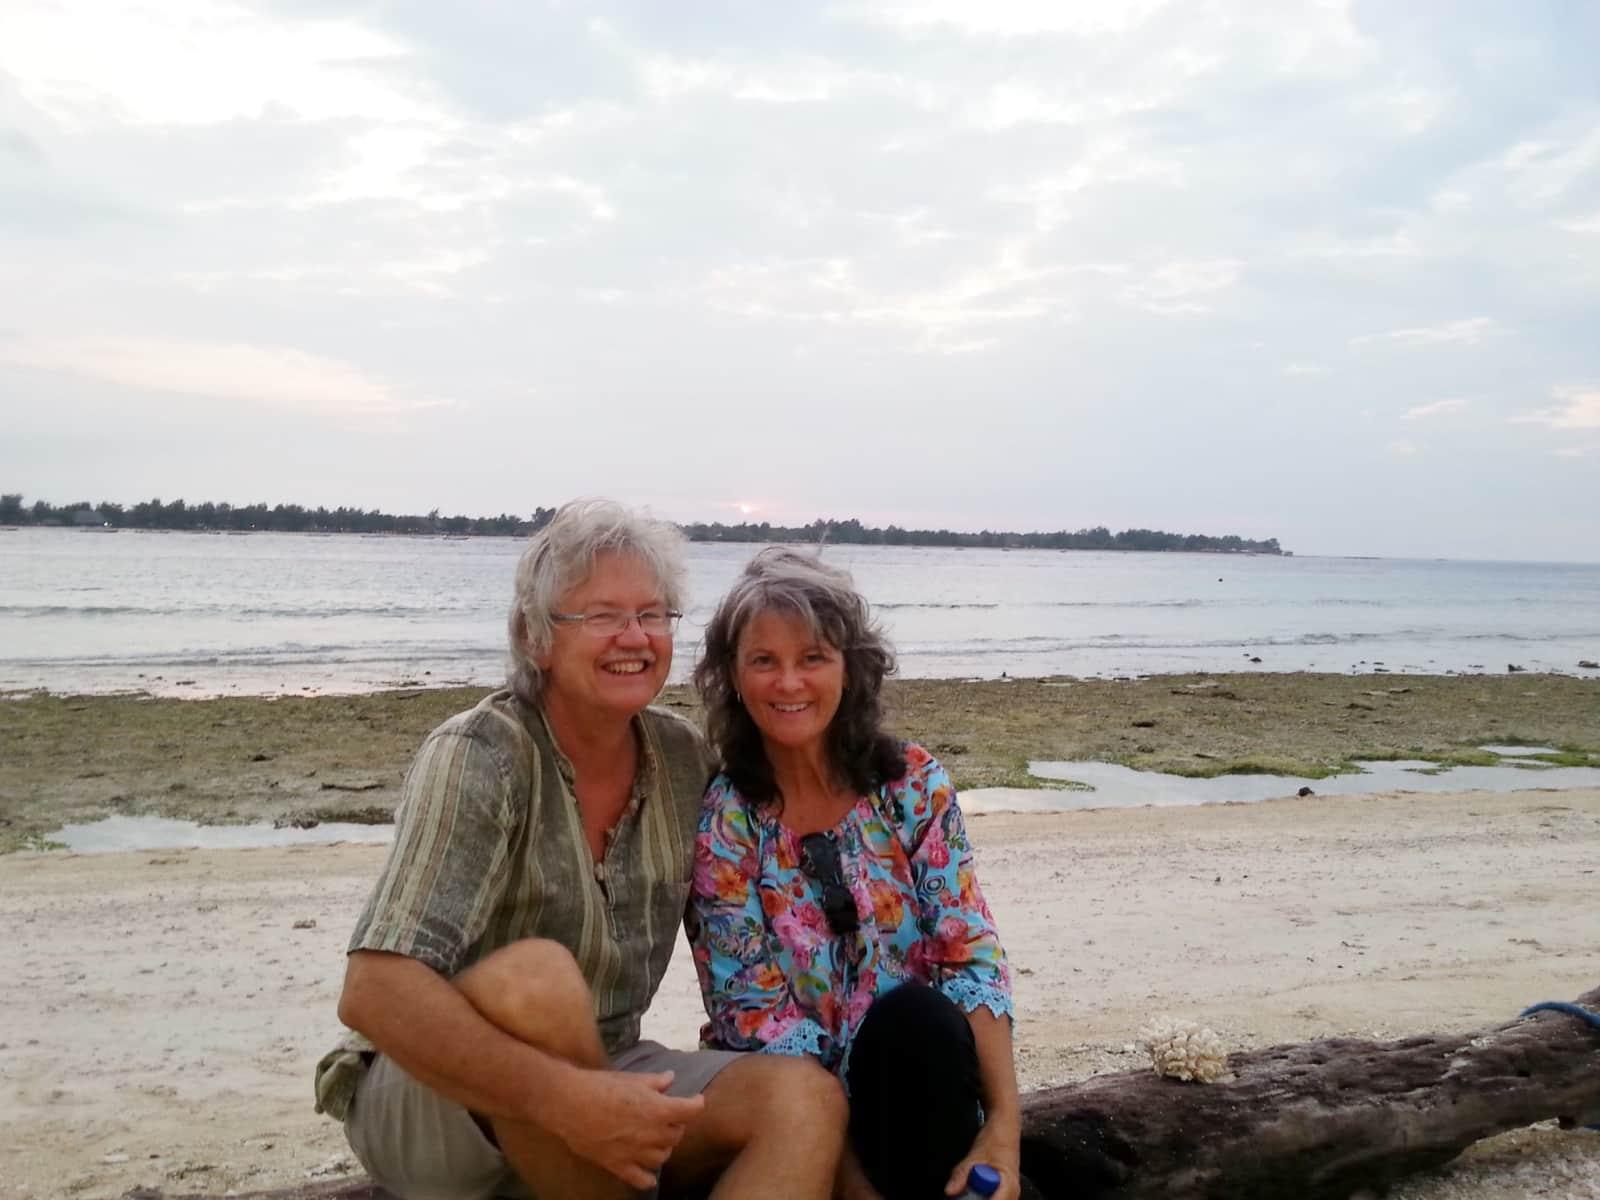 Noela & Paul from Sunshine Coast, Queensland, Australia